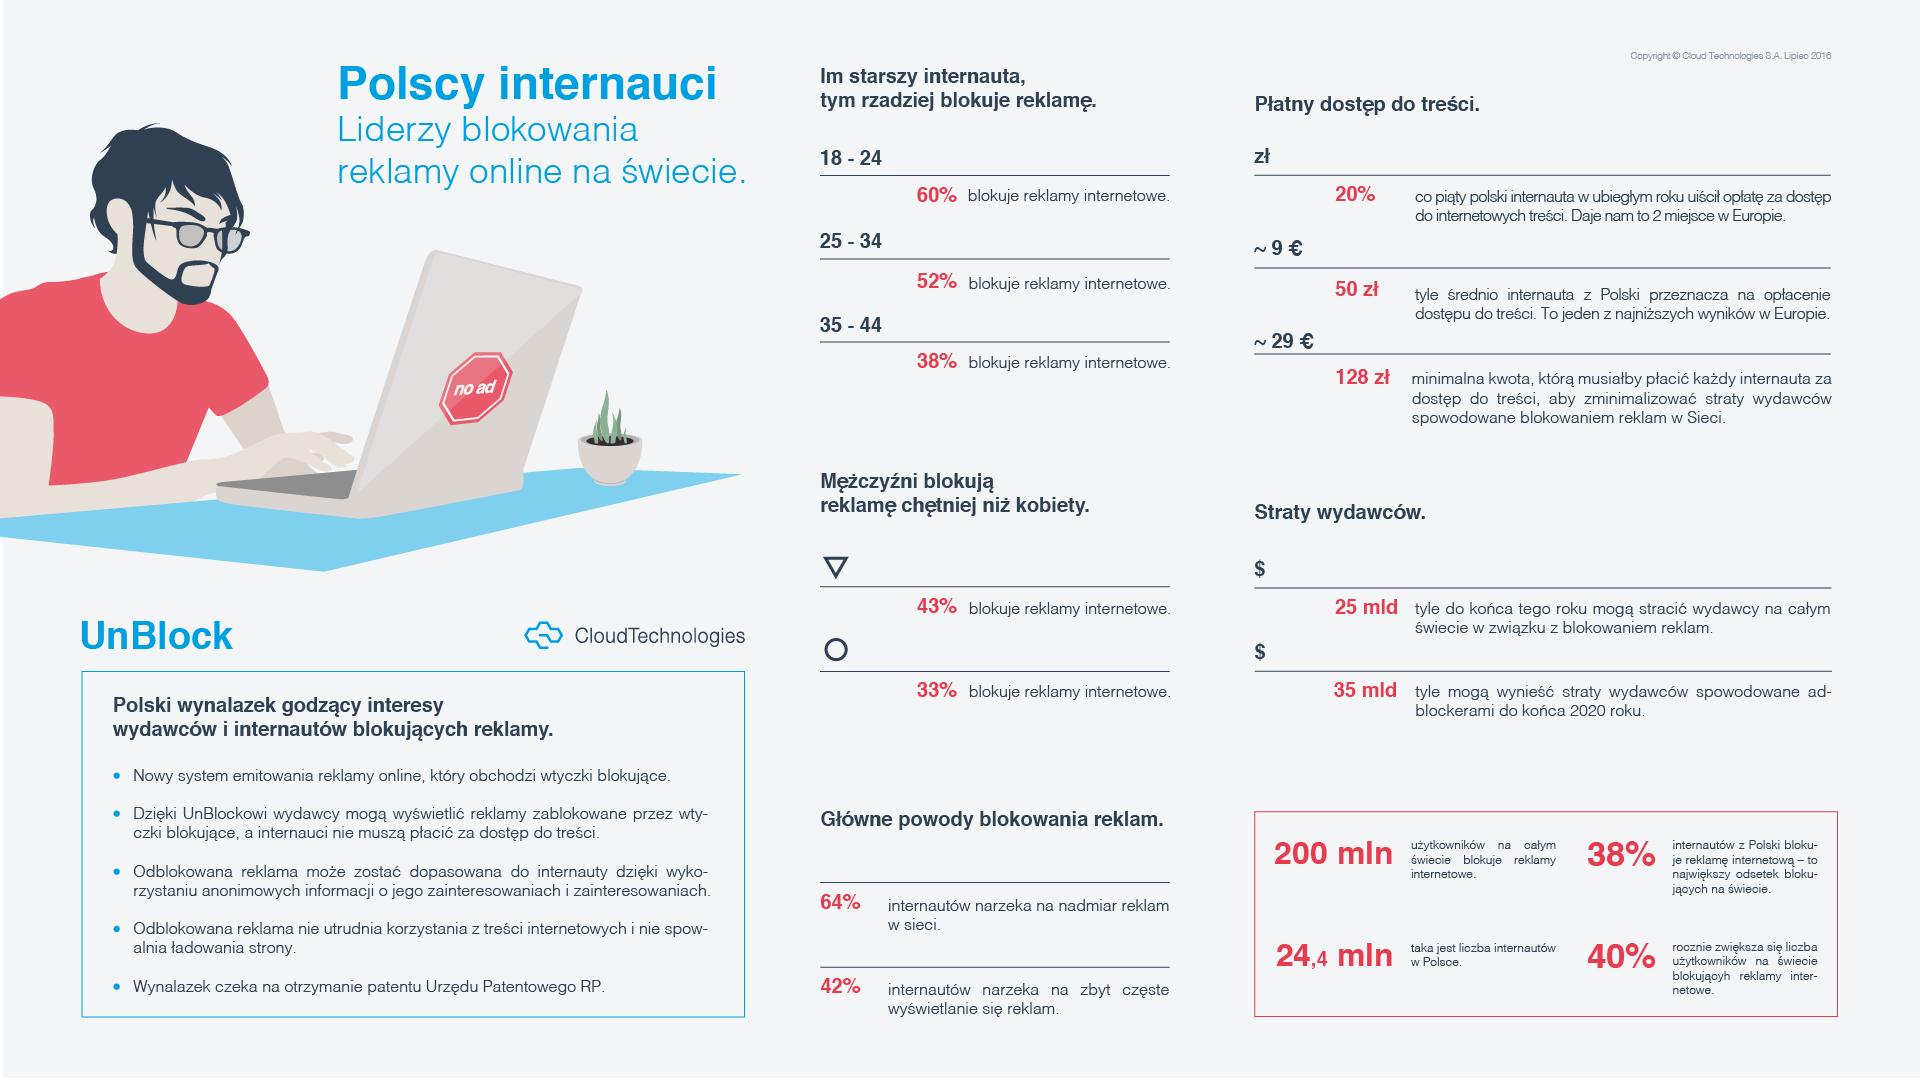 CloudTechnologies_infografika_polscy internauci_1920x1080